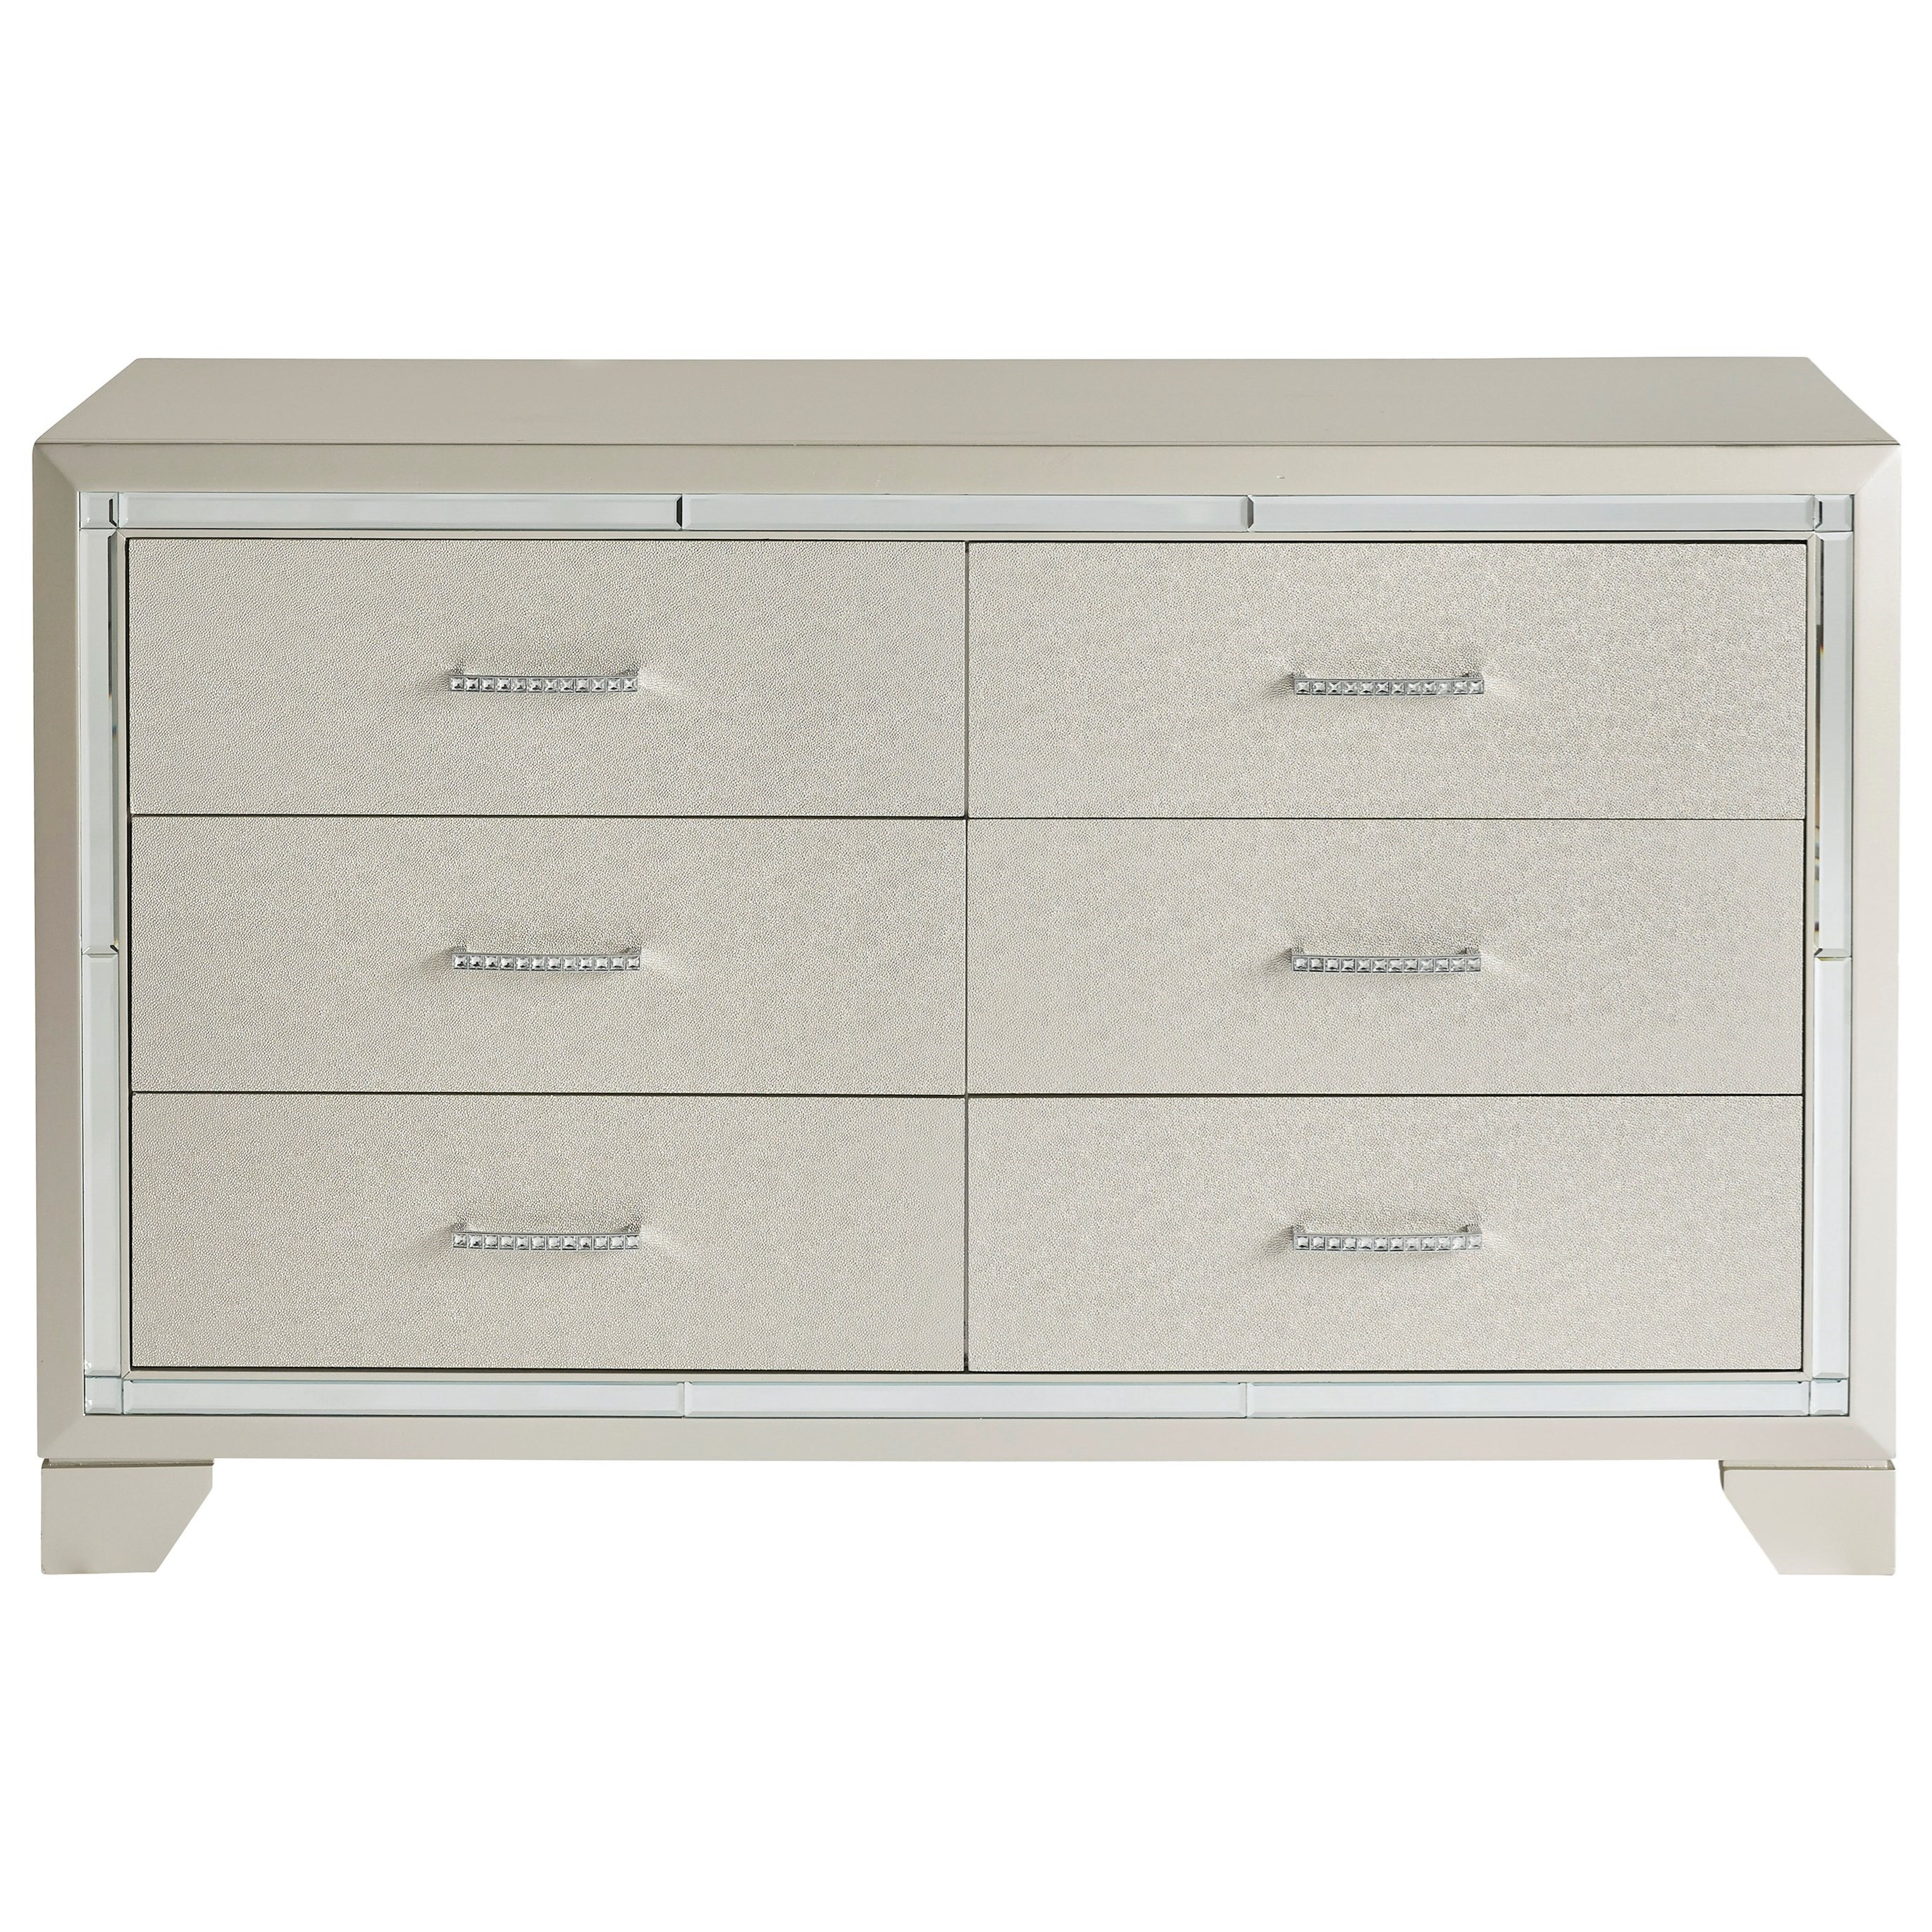 Lonnix 6 Drawer Dresser by Signature Design by Ashley at HomeWorld Furniture